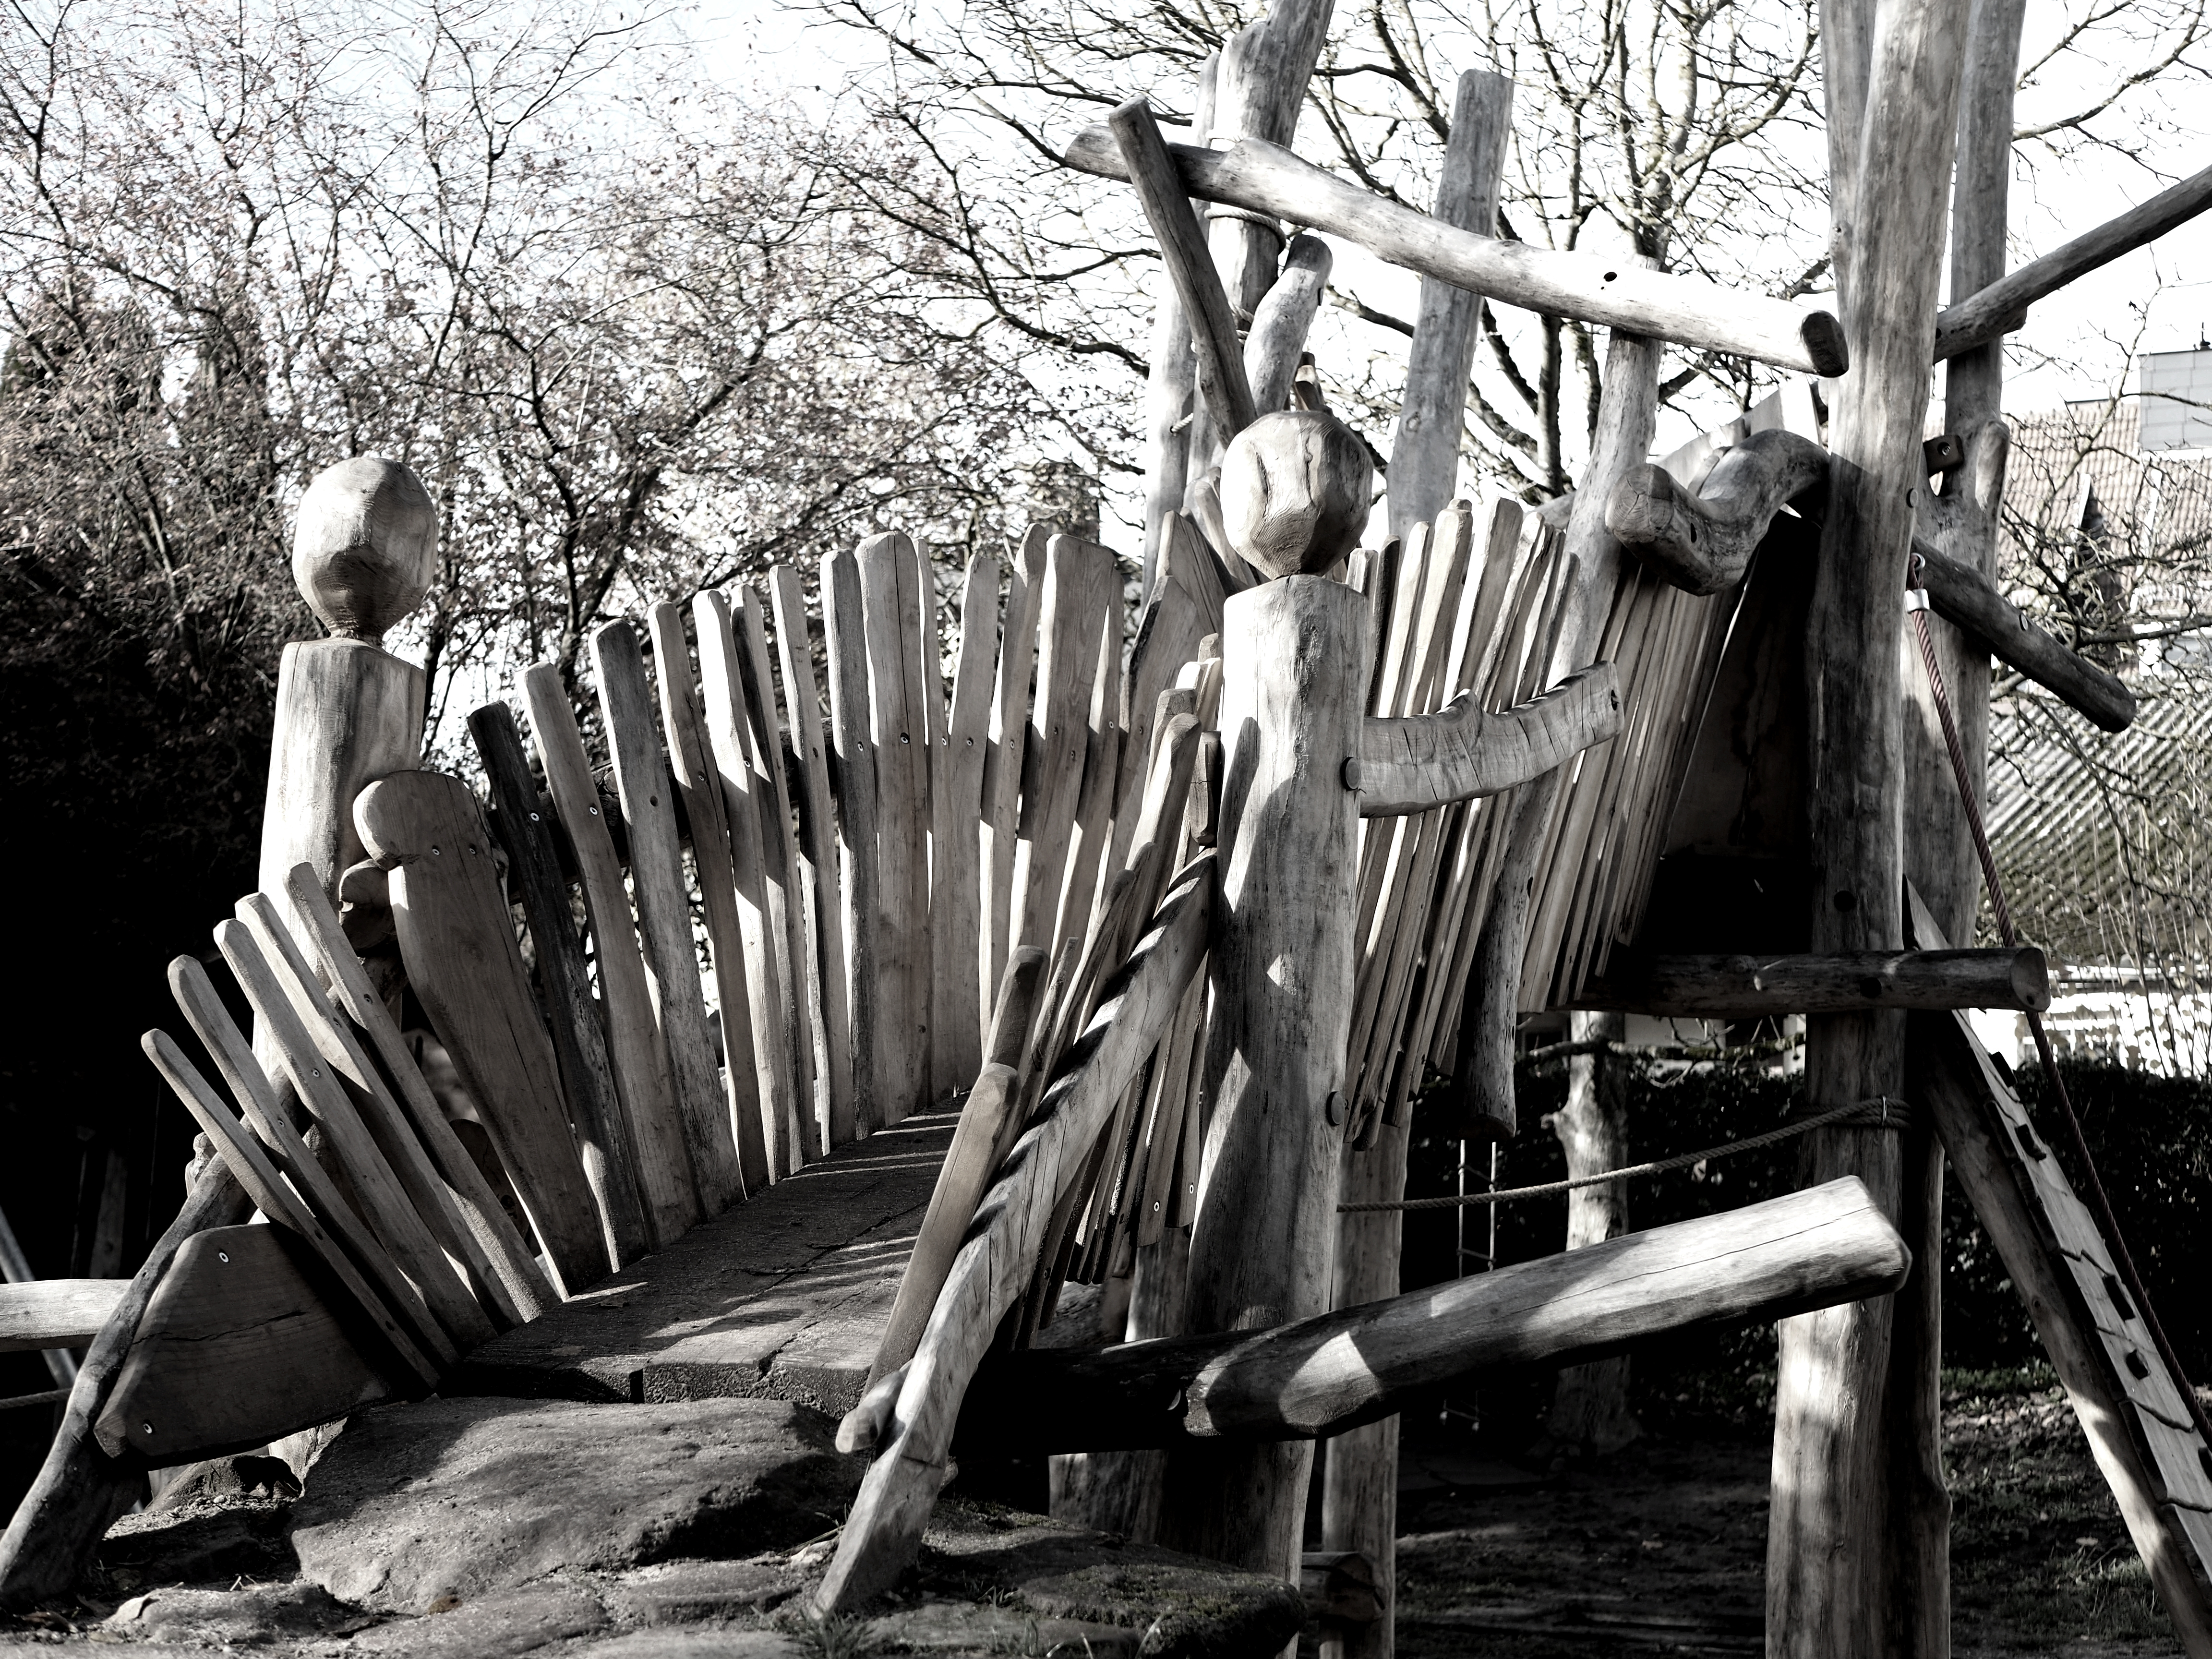 Wildes Holz